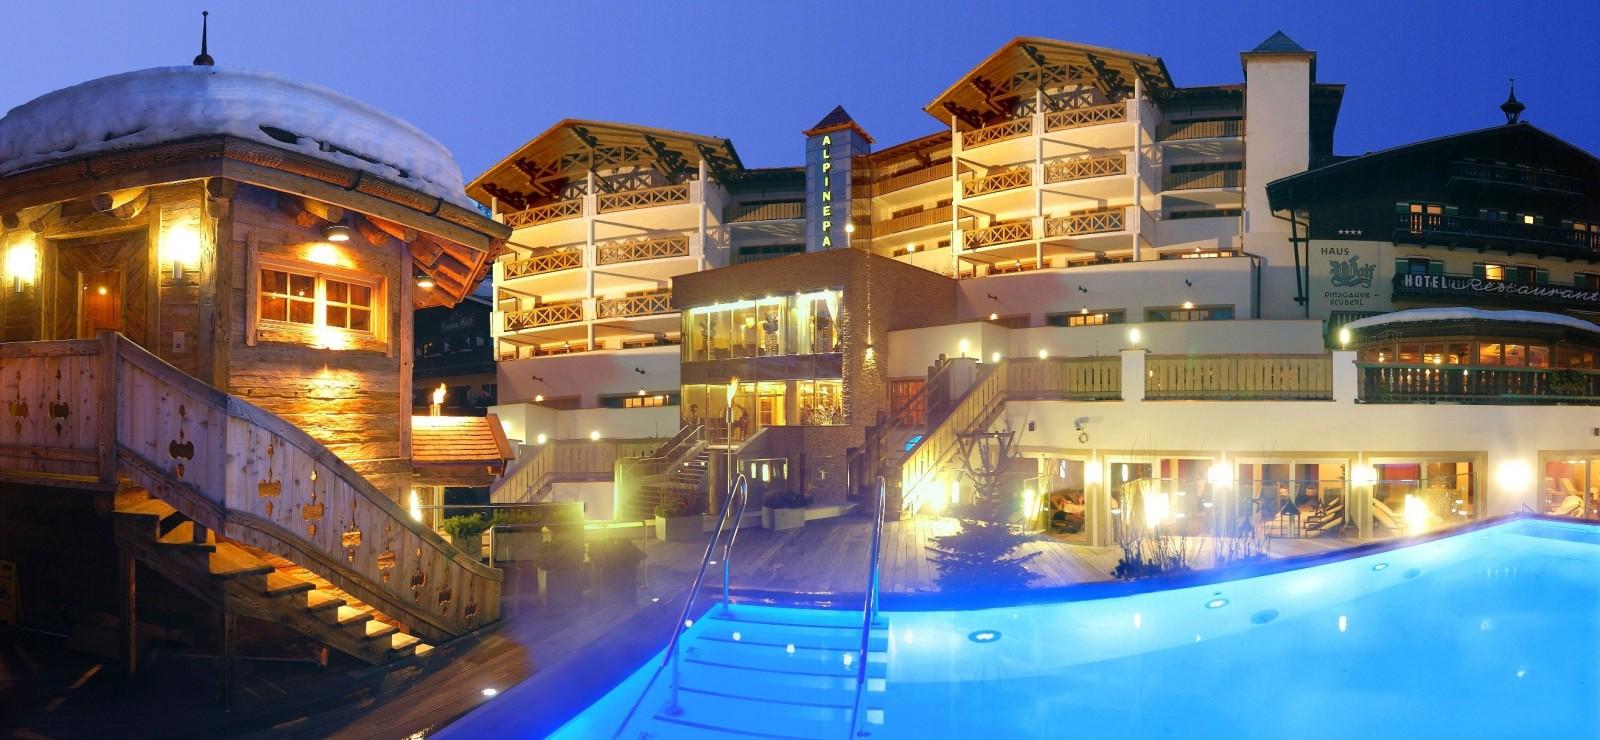 Hotel Alpine Palace Bilder | Bild 1